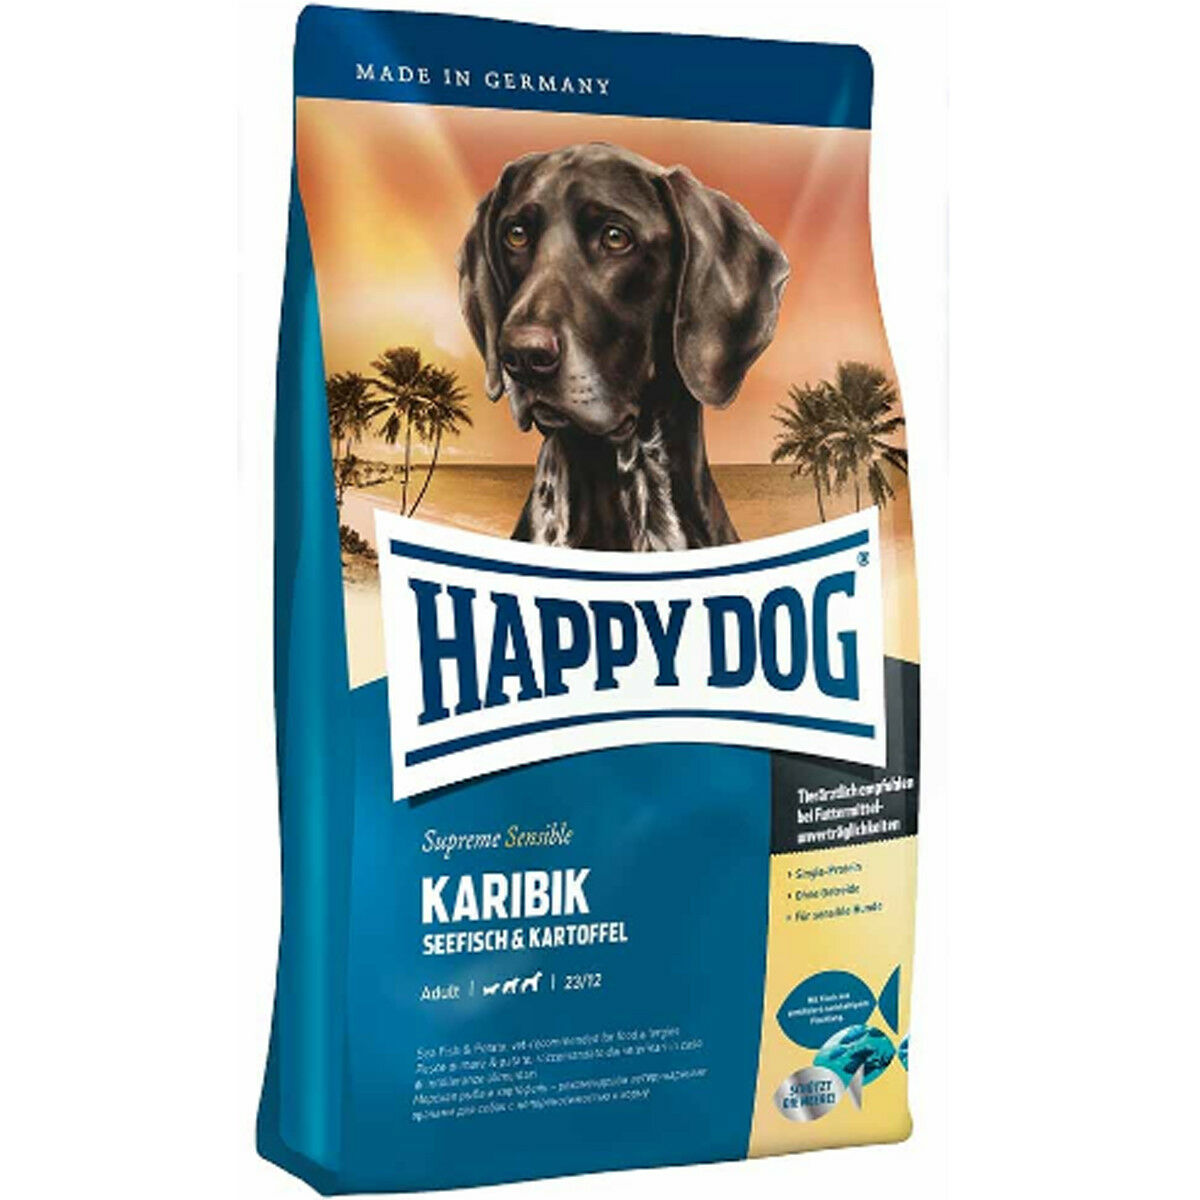 Happy DOG Supreme sensibili Caraibi hdsk cibo per cani ideale per   soffre di allergie MANGIME